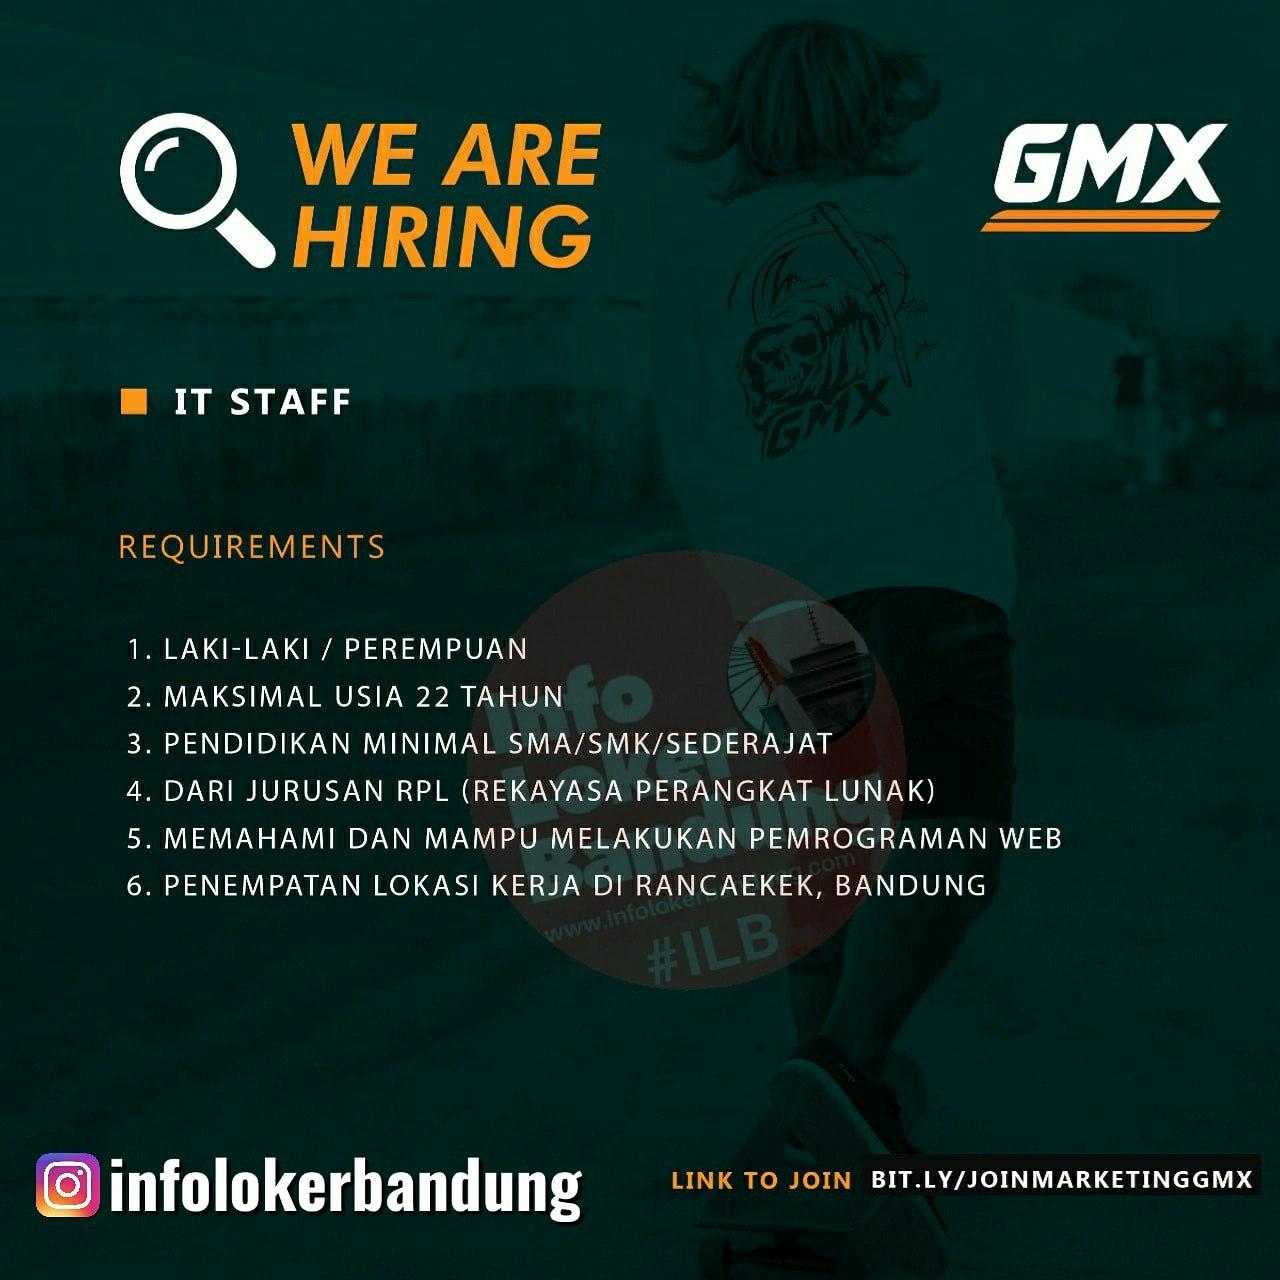 Lowongan Kerja It Geoff Max Footwear Bandung Juni 2020 Info Loker Bandung 2021